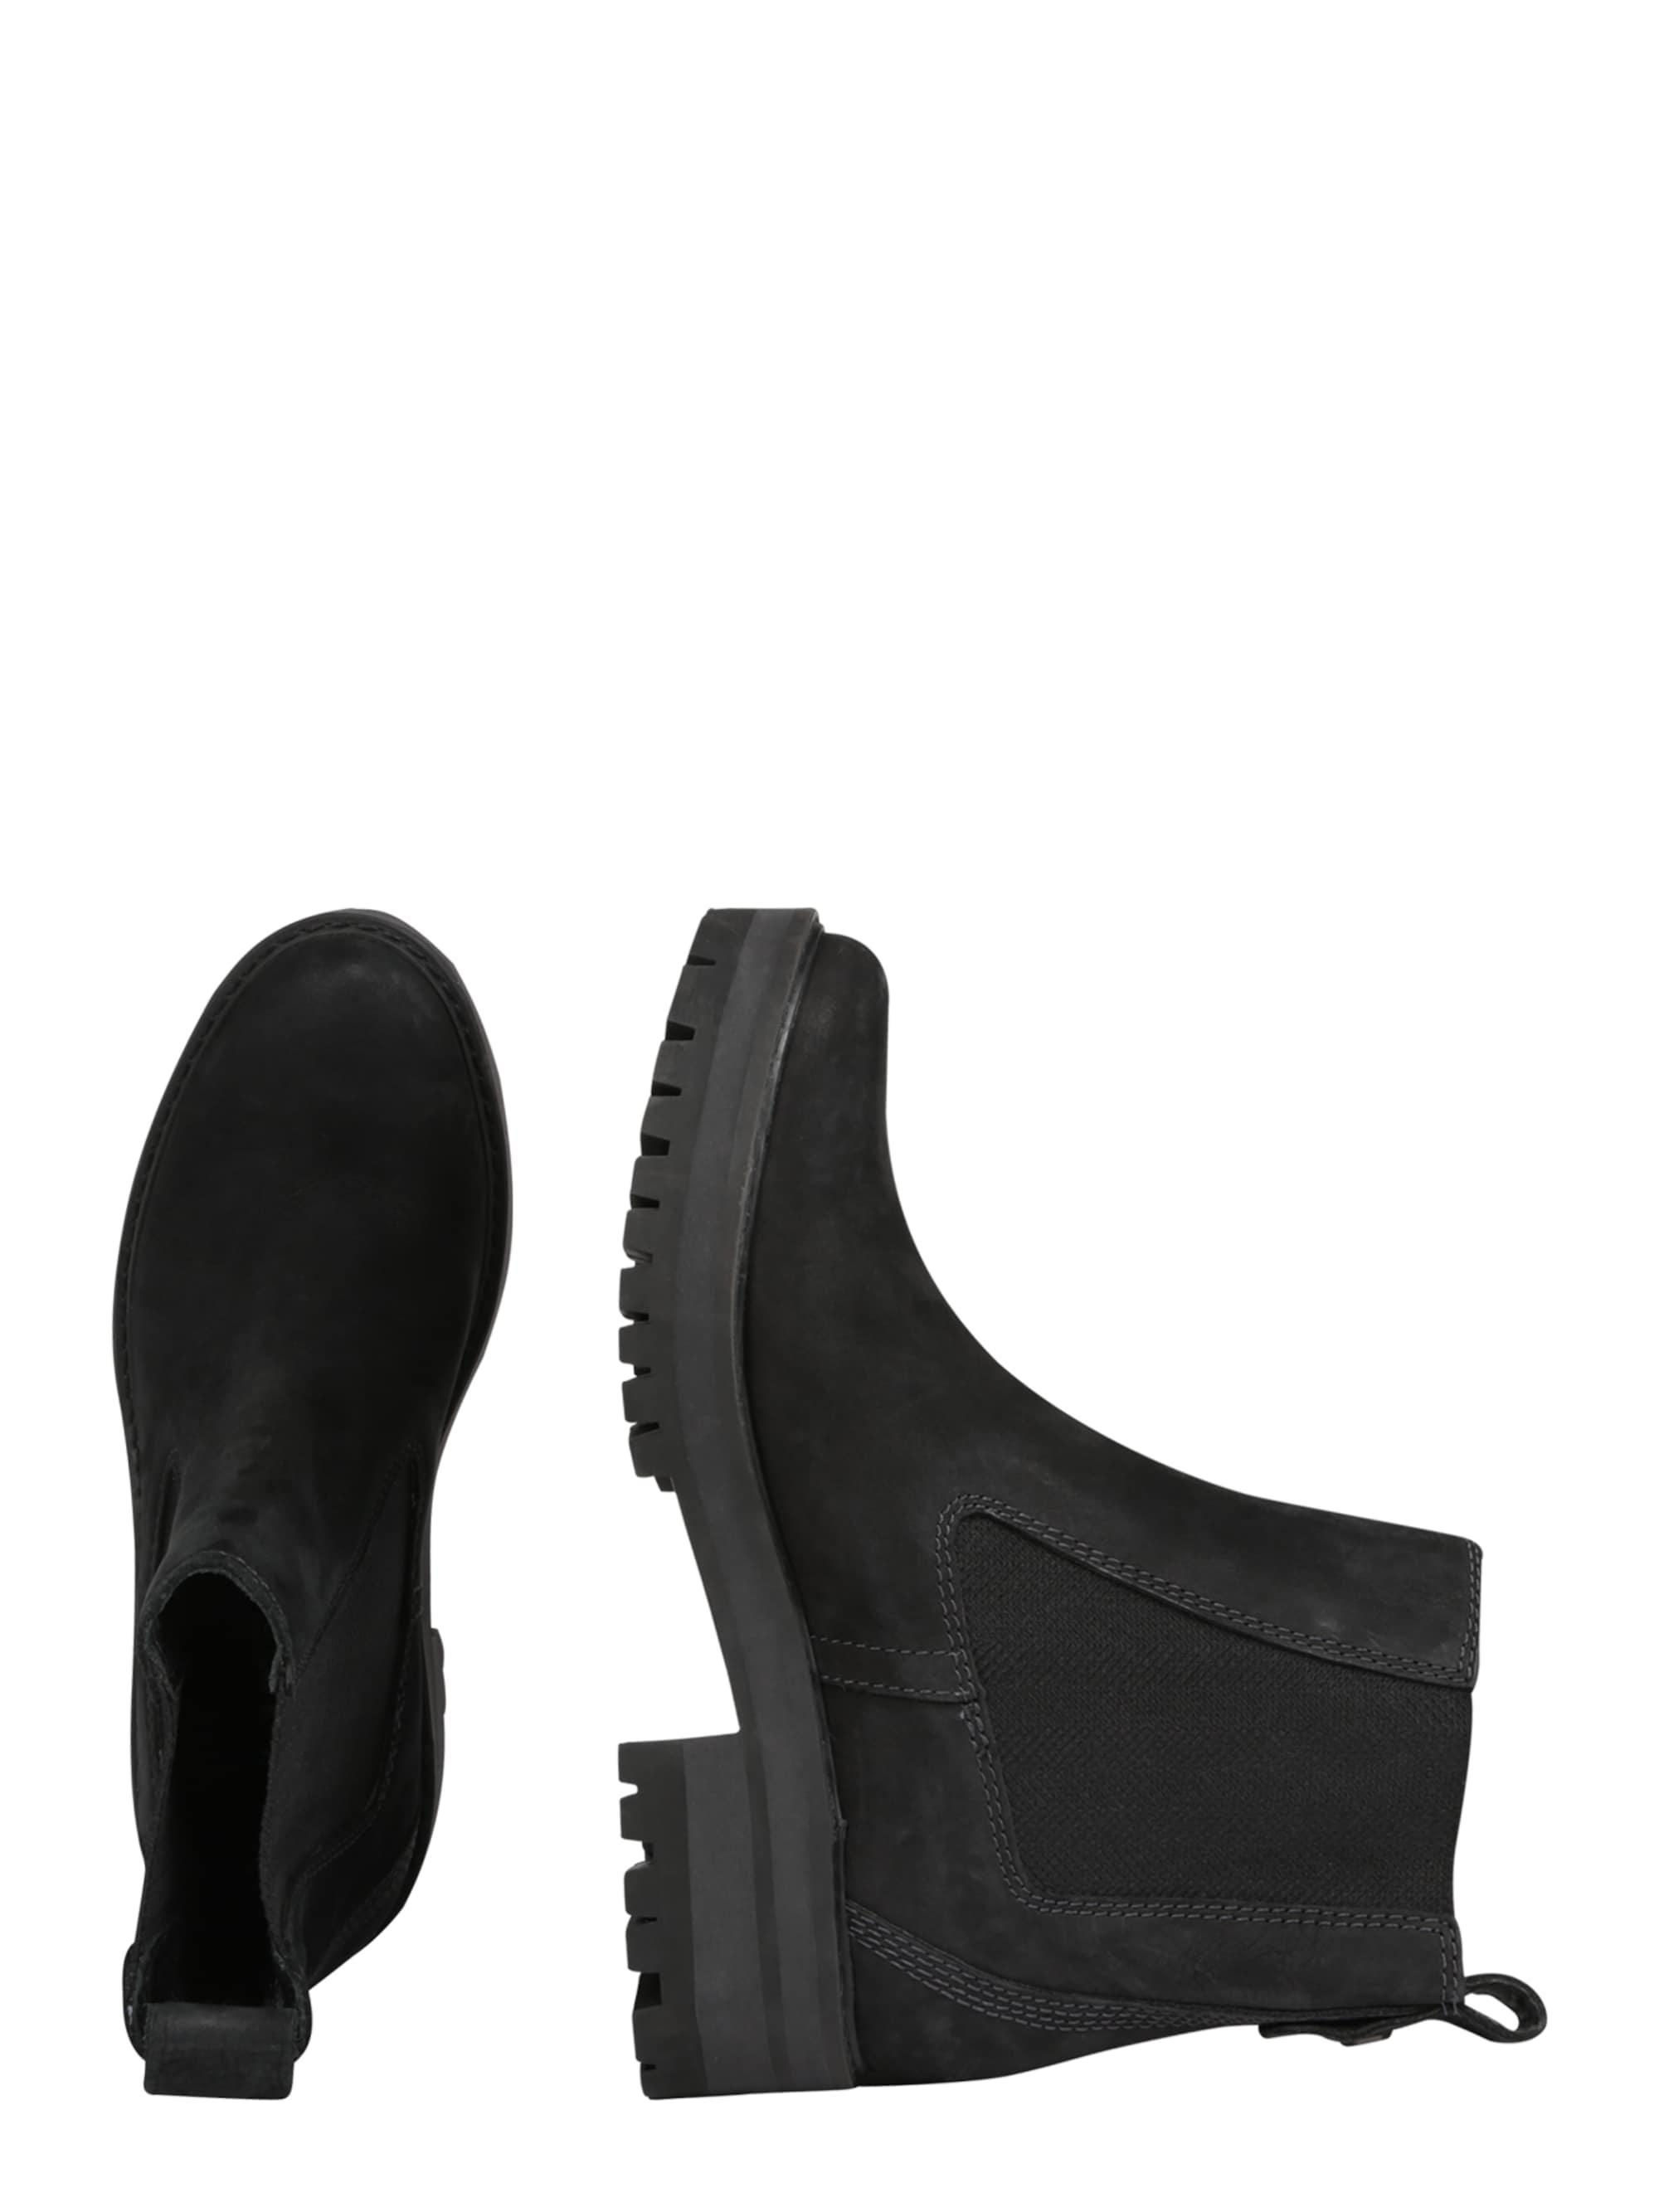 Chelsea boots 'Courmayeur Valley'